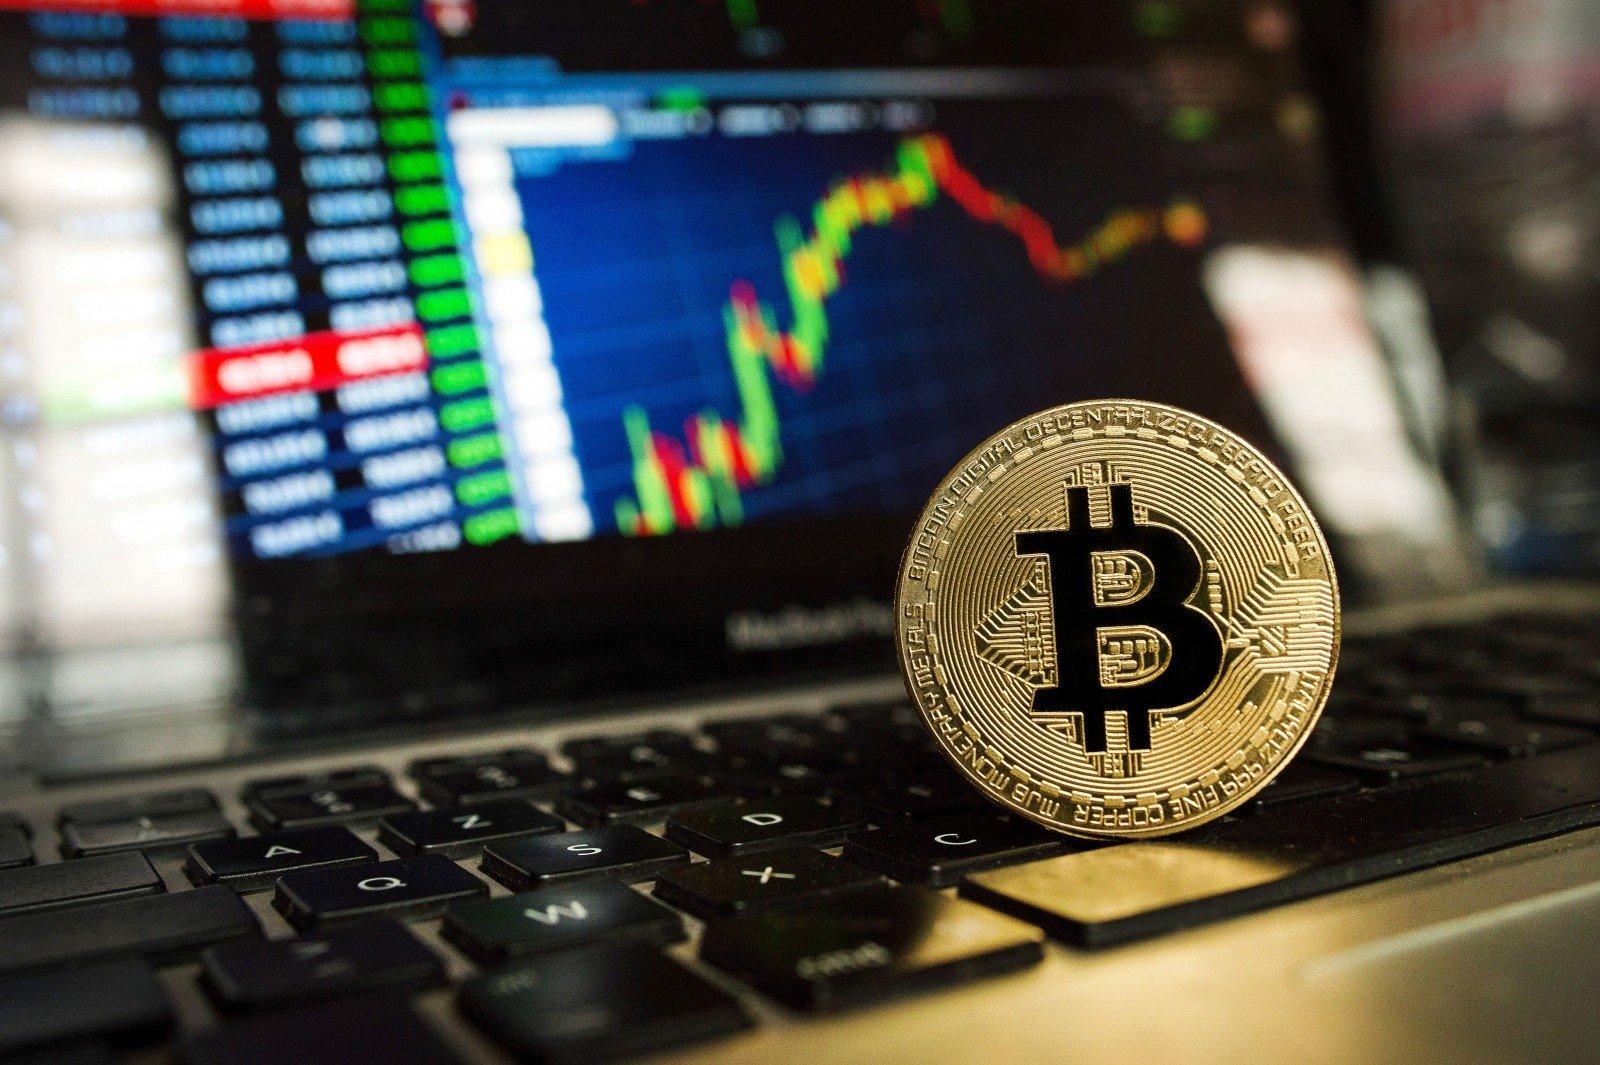 bitkoinų prognozė)